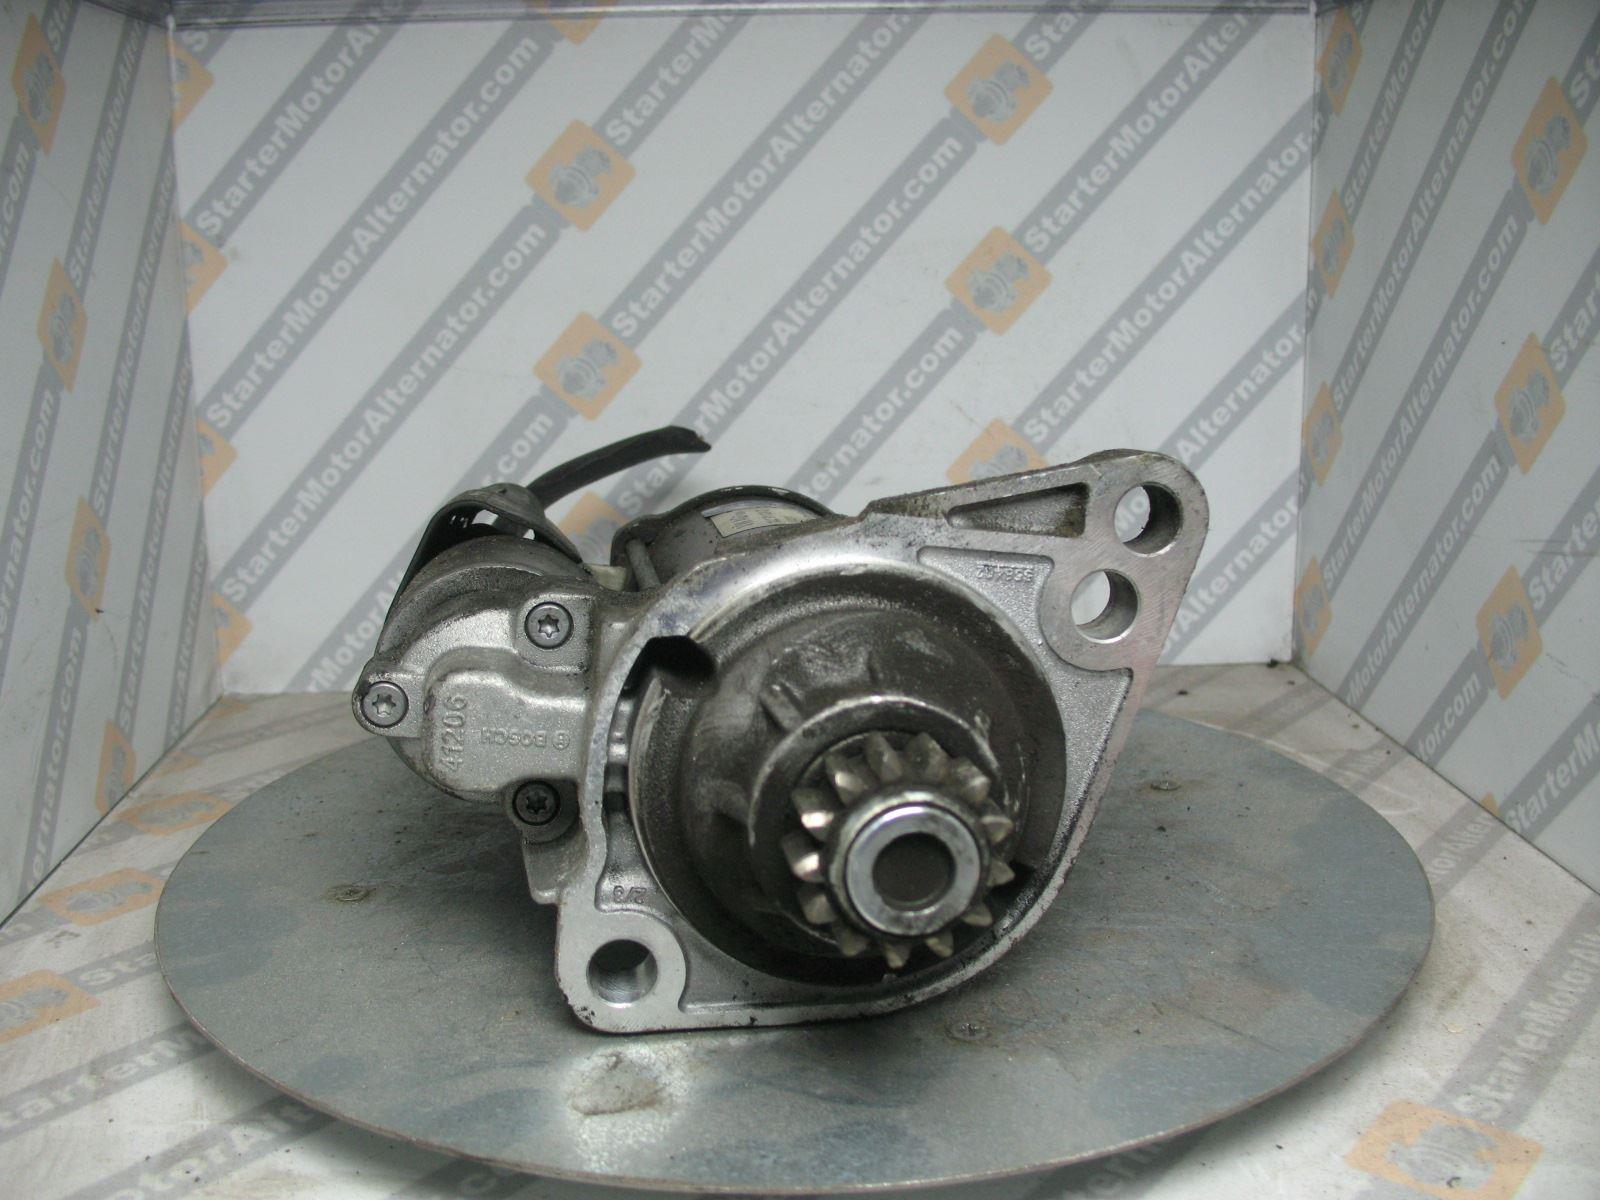 XIY2661 Starter Motor For Audi / Seat / Skoda / Volkswagen